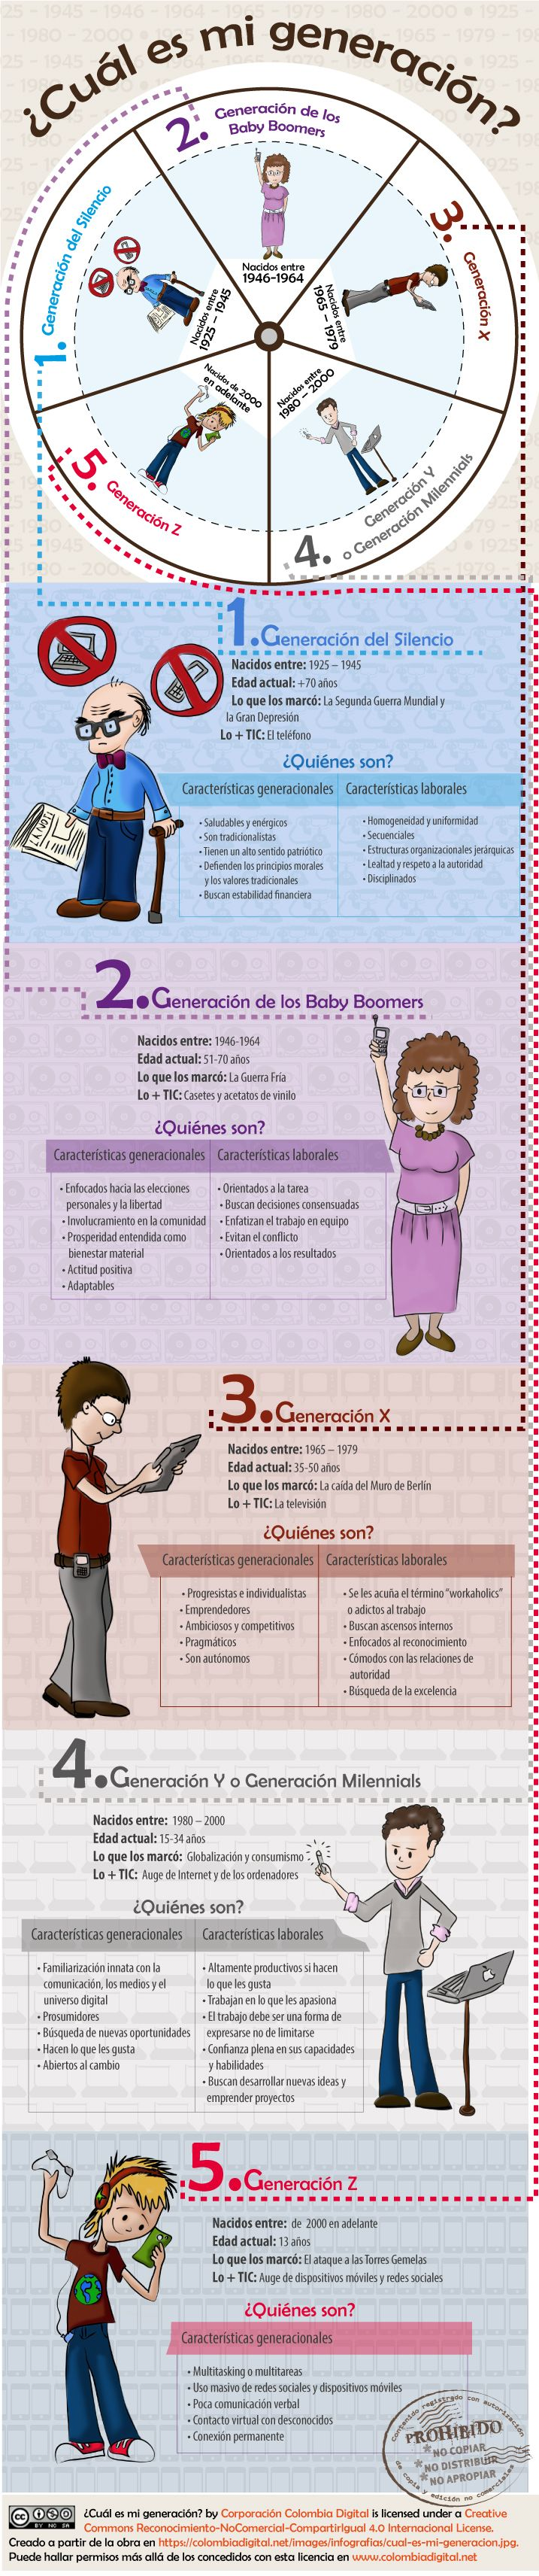 infografia_cual_es_tu_generacion.jpg (717×3424)